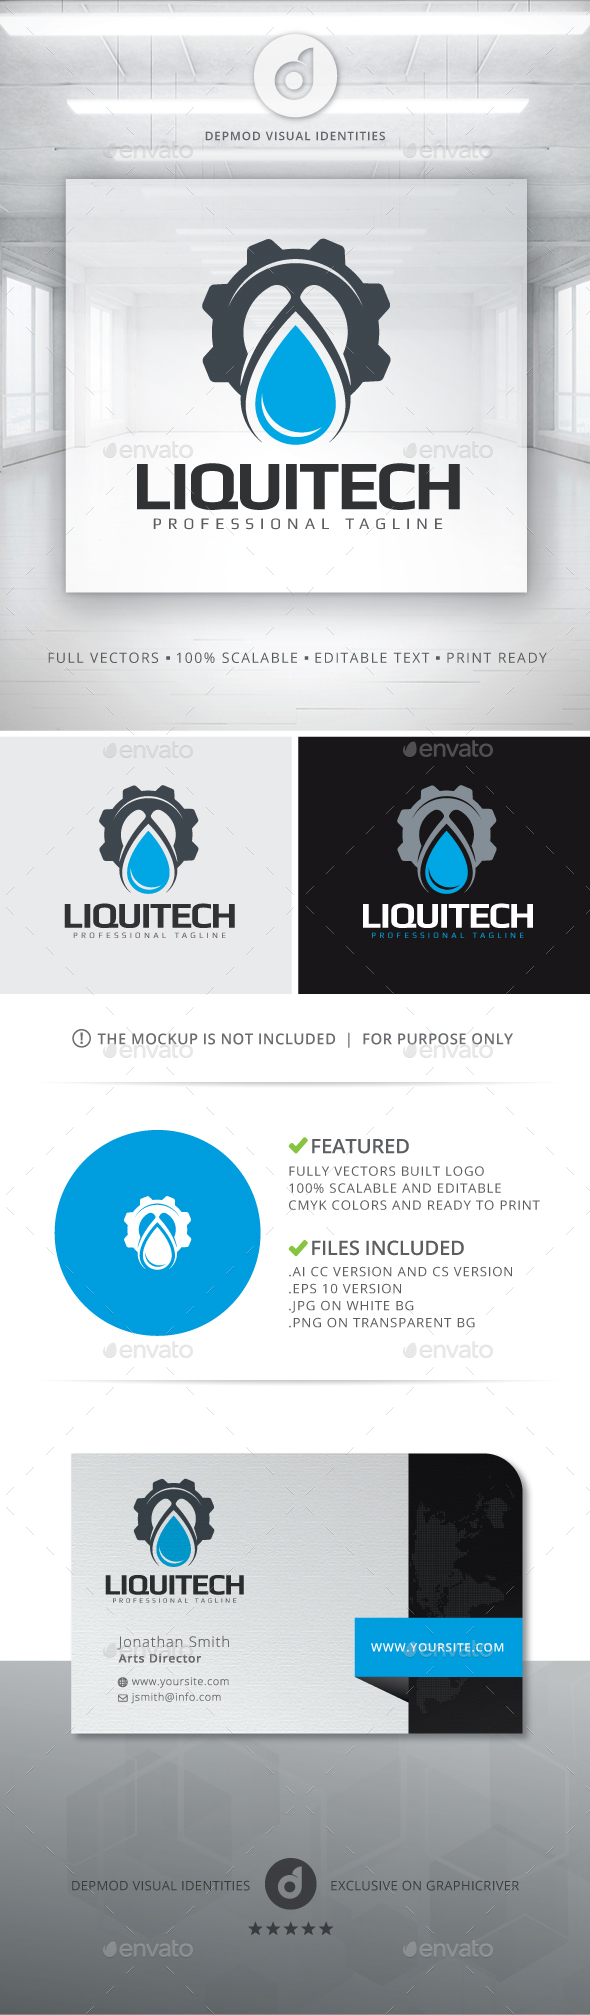 Liquitech Logo